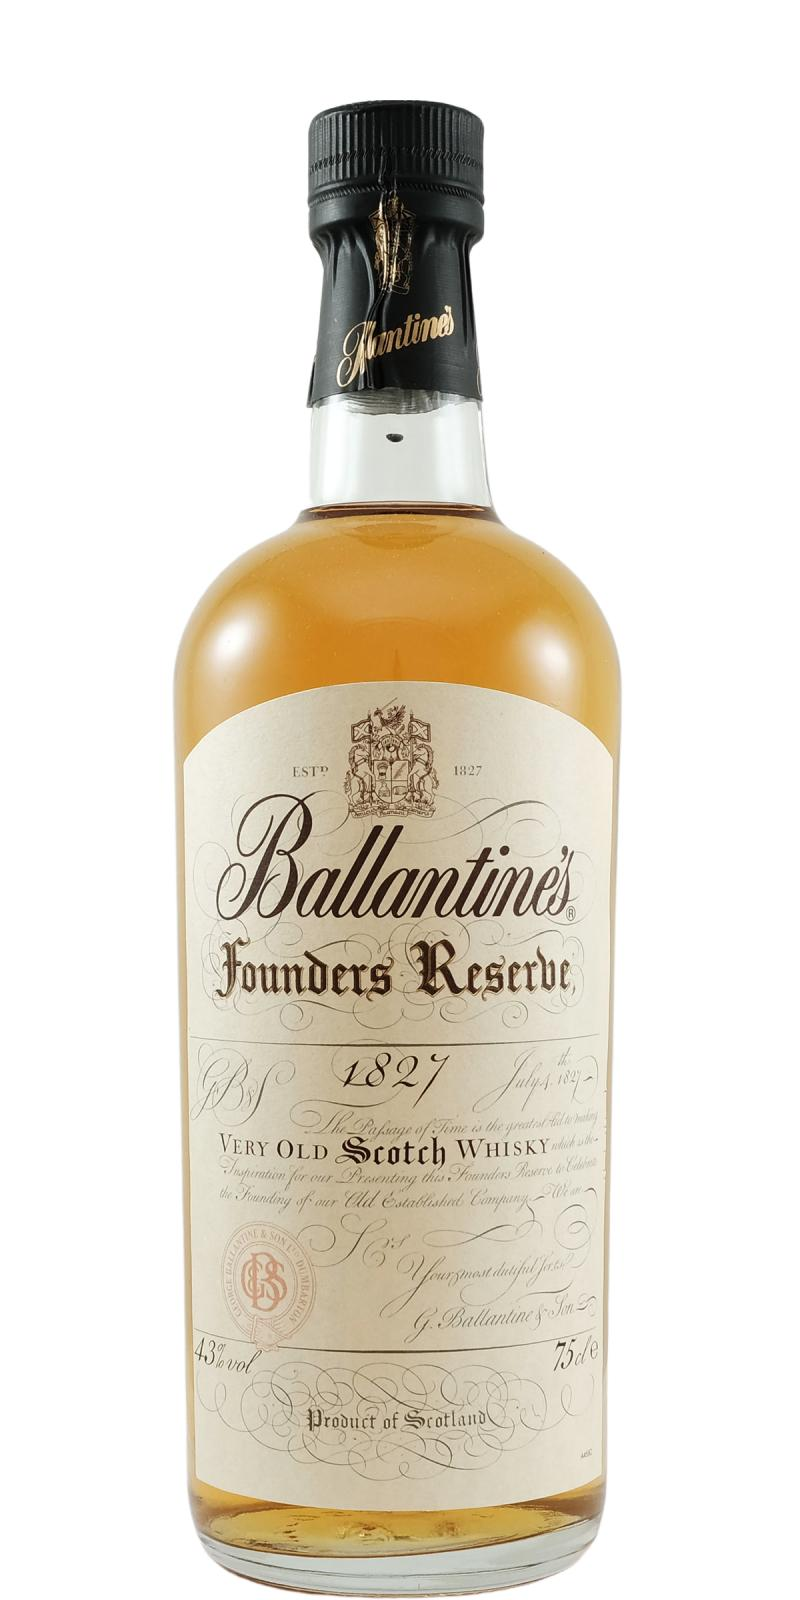 Ballantine's Founders Reserve 1827